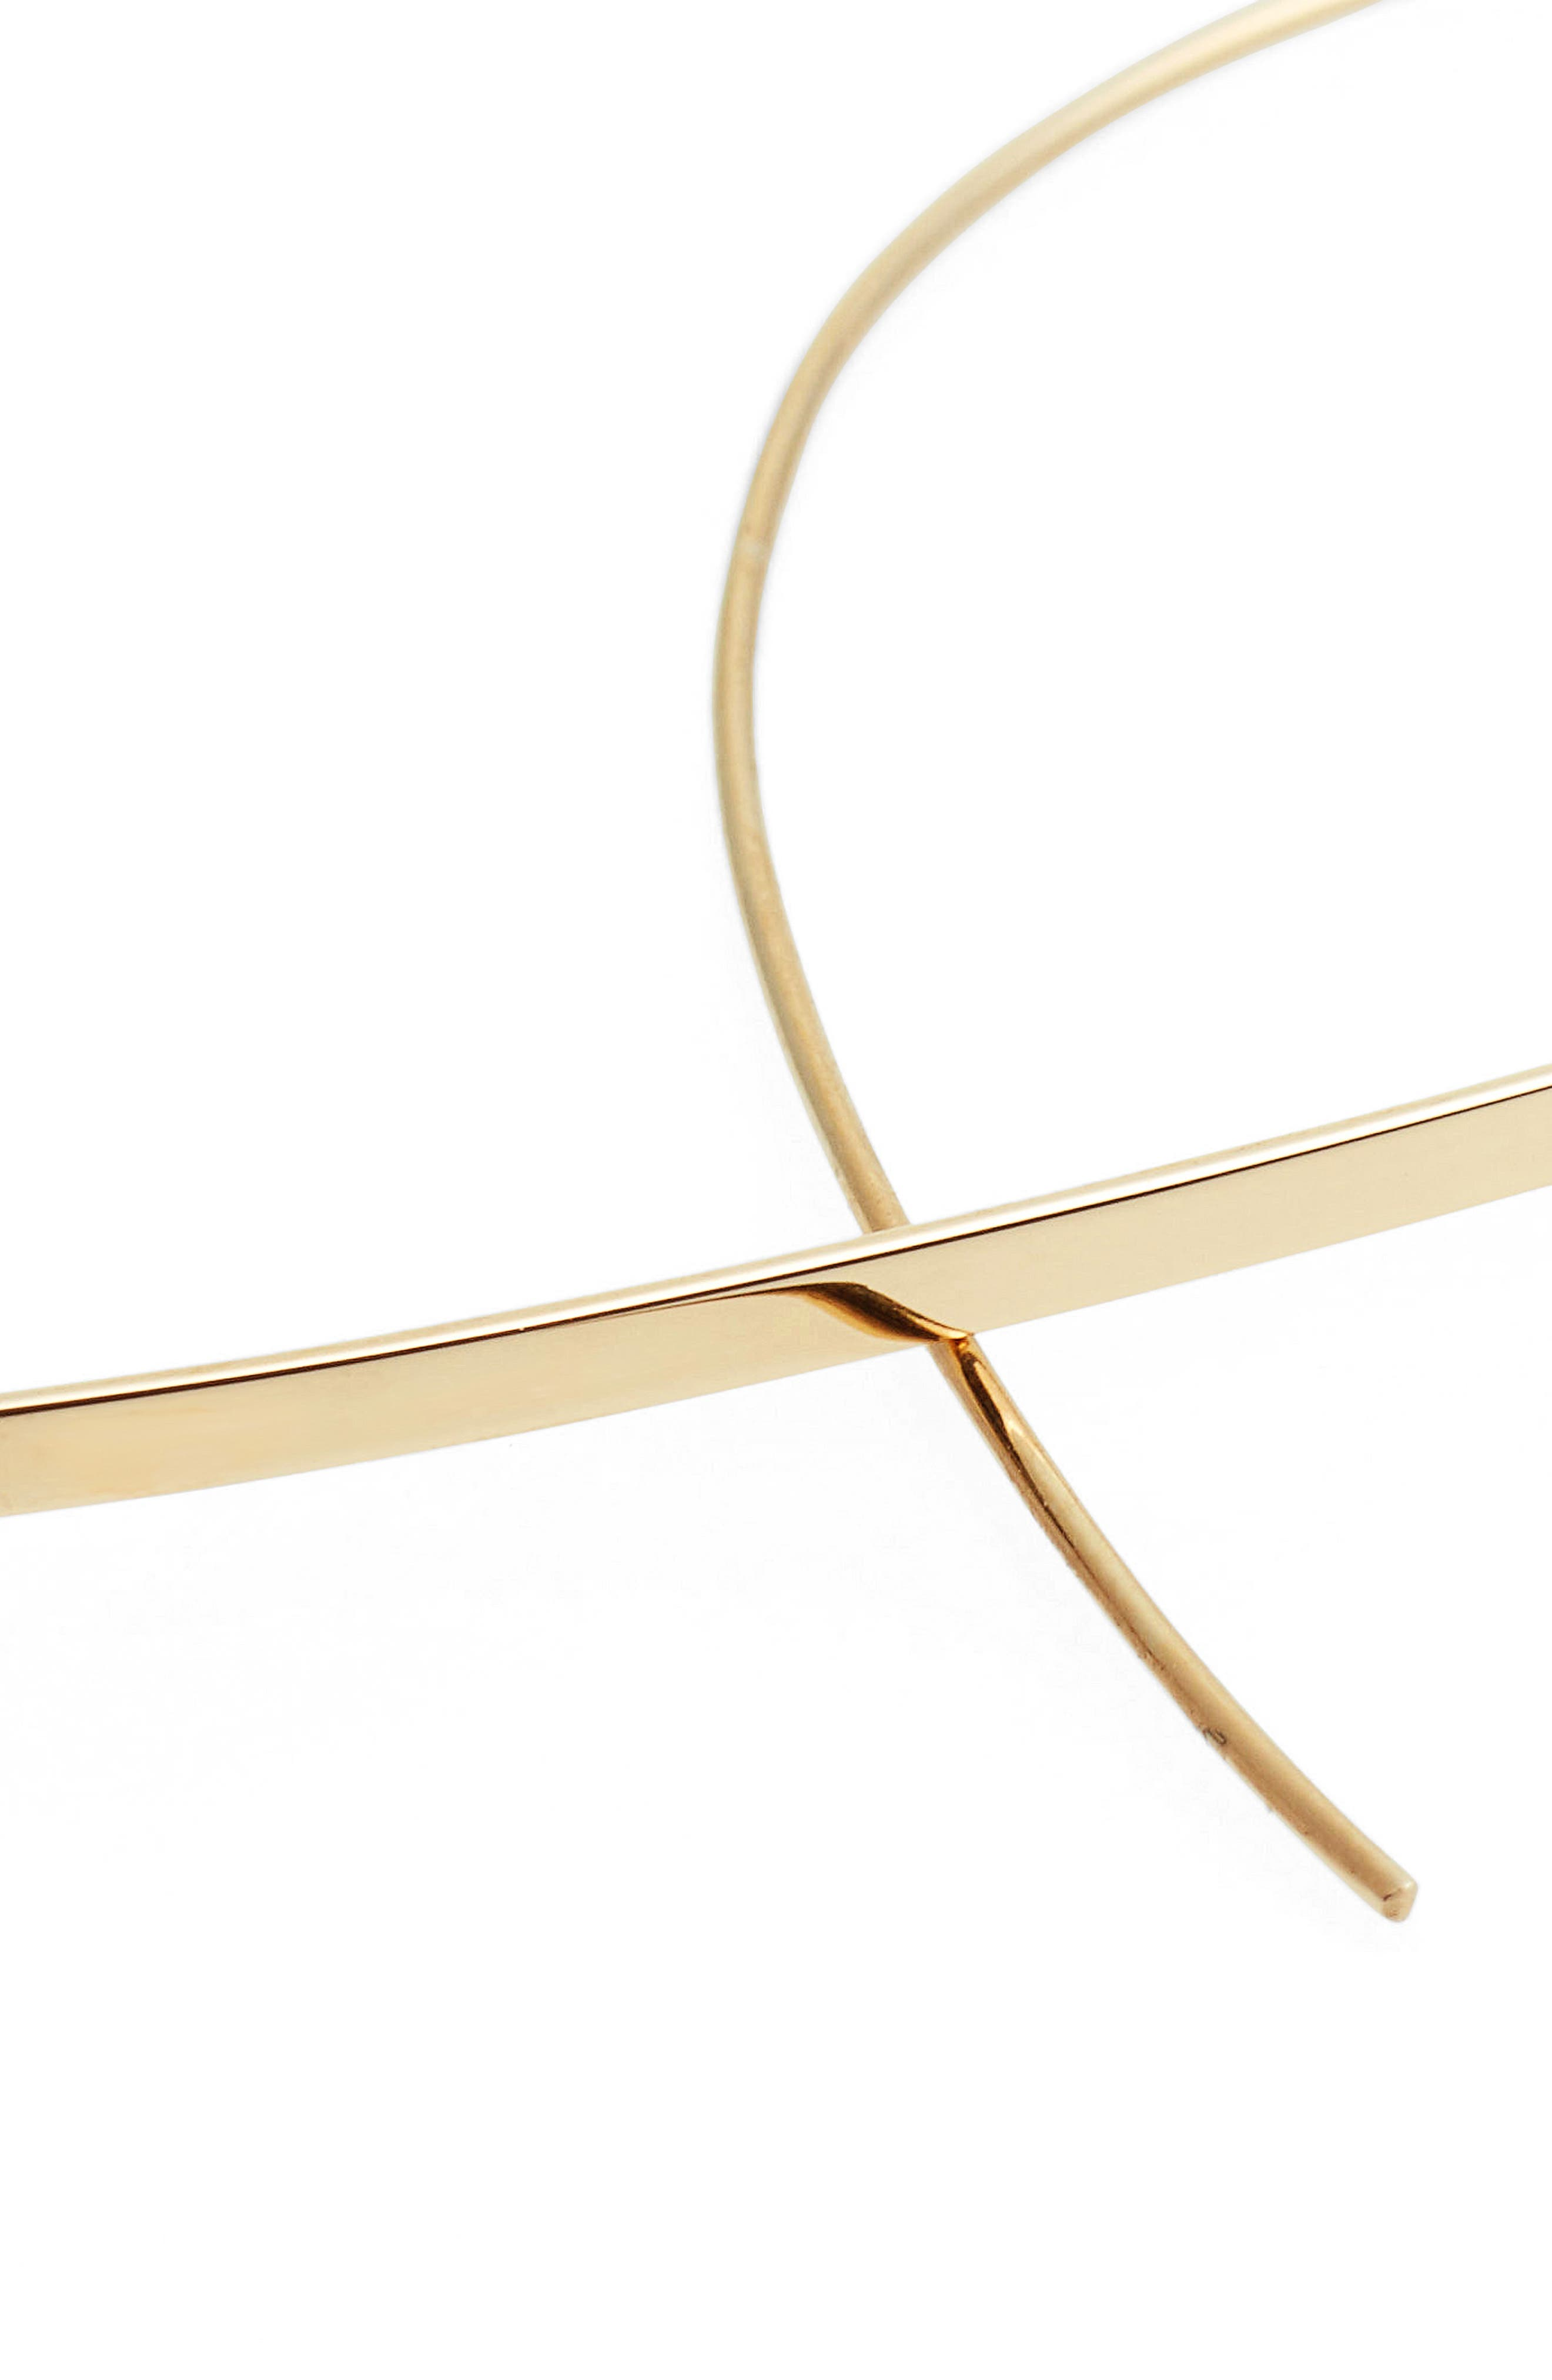 Medium Upside Down Hoop Earrings,                             Alternate thumbnail 4, color,                             YELLOW GOLD